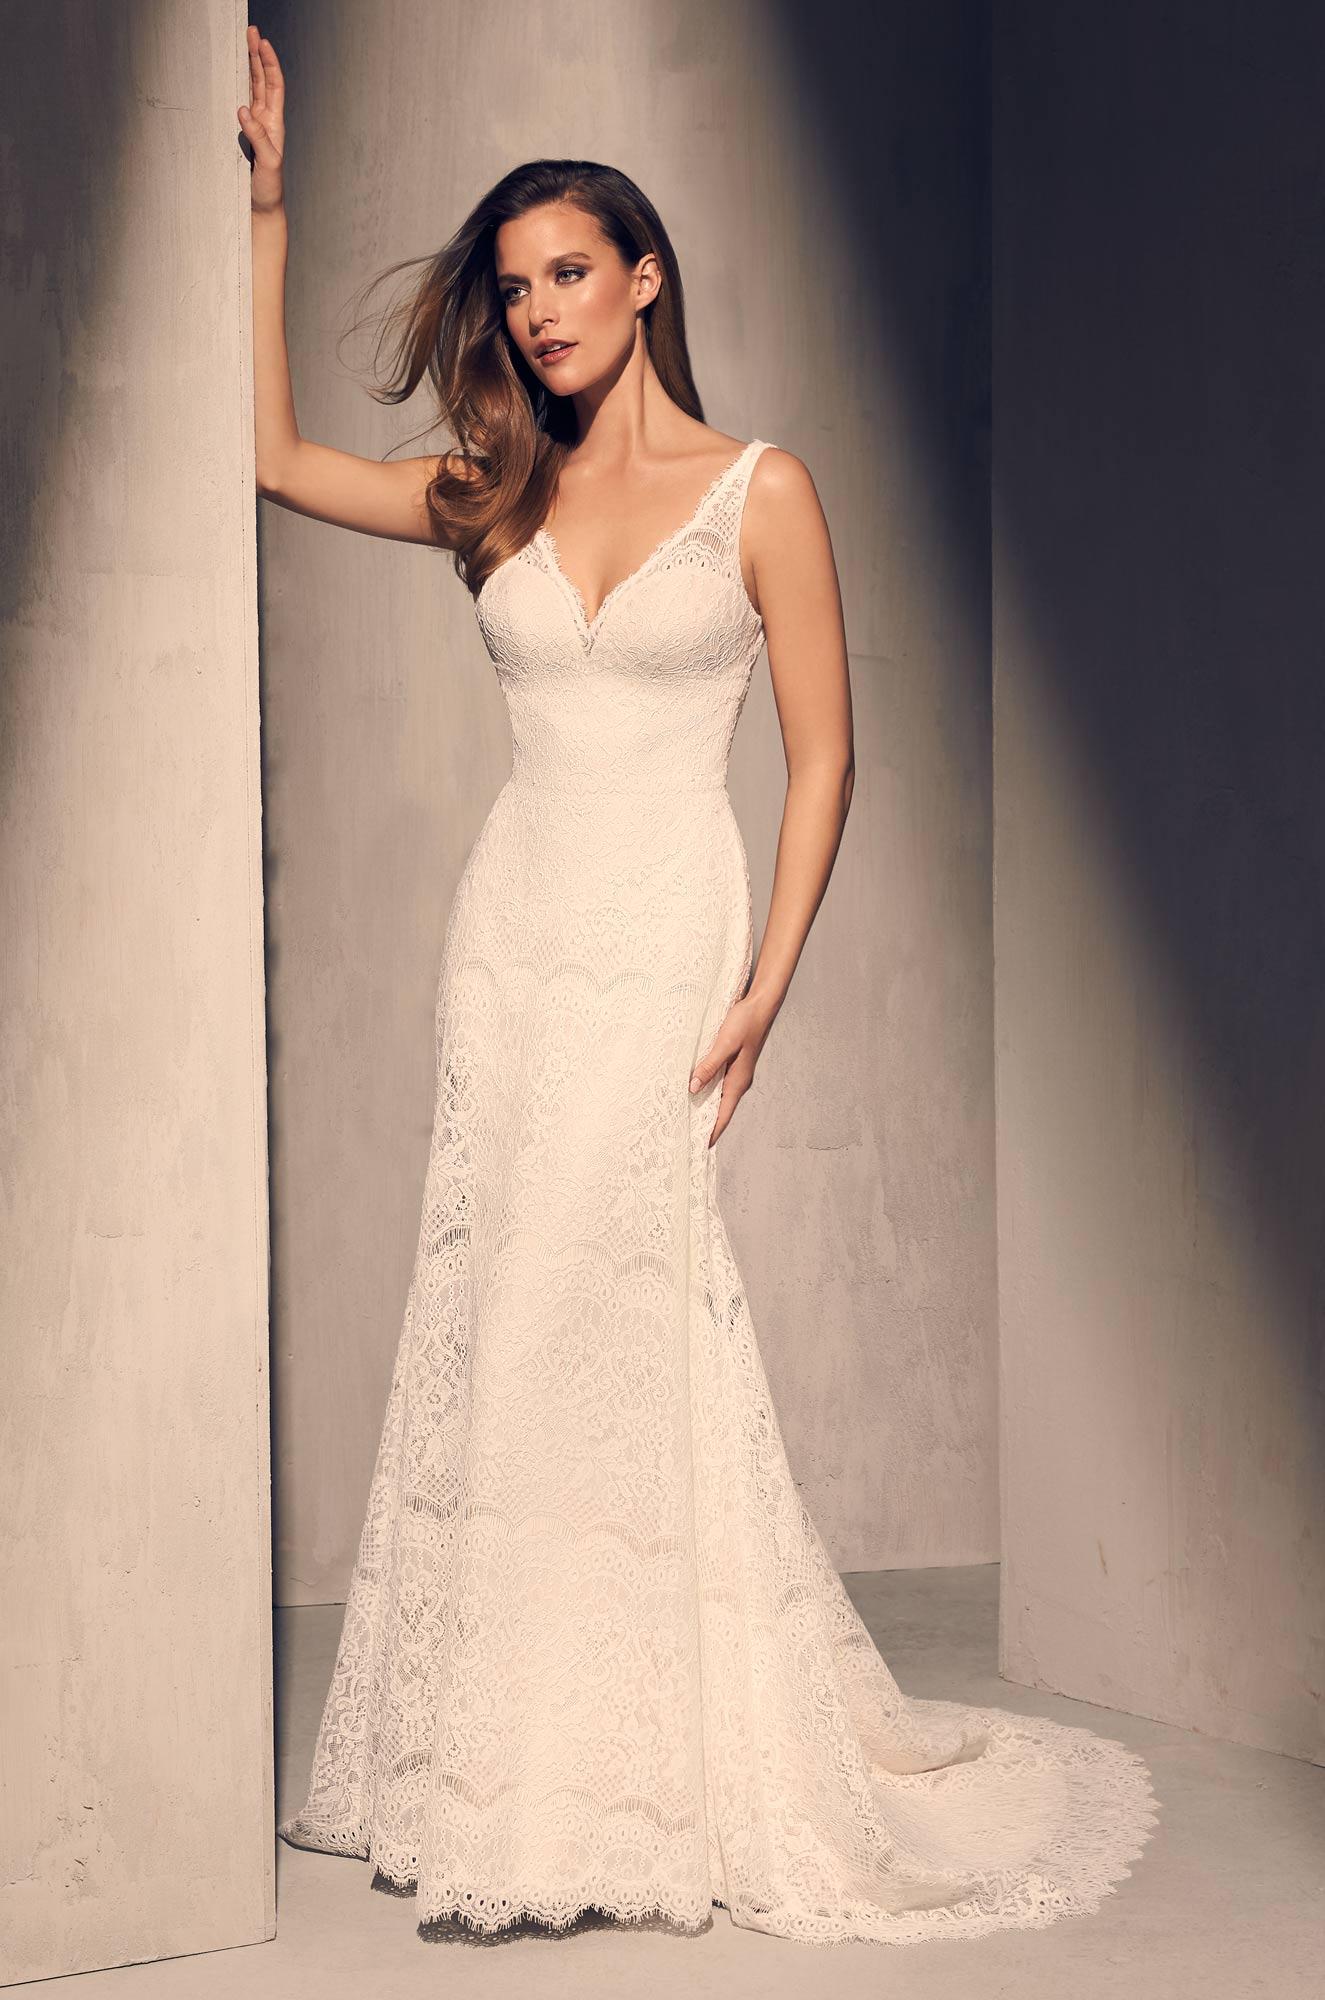 Mira Couture Mikaella 2217 Wedding Dress Bridal Gown Full